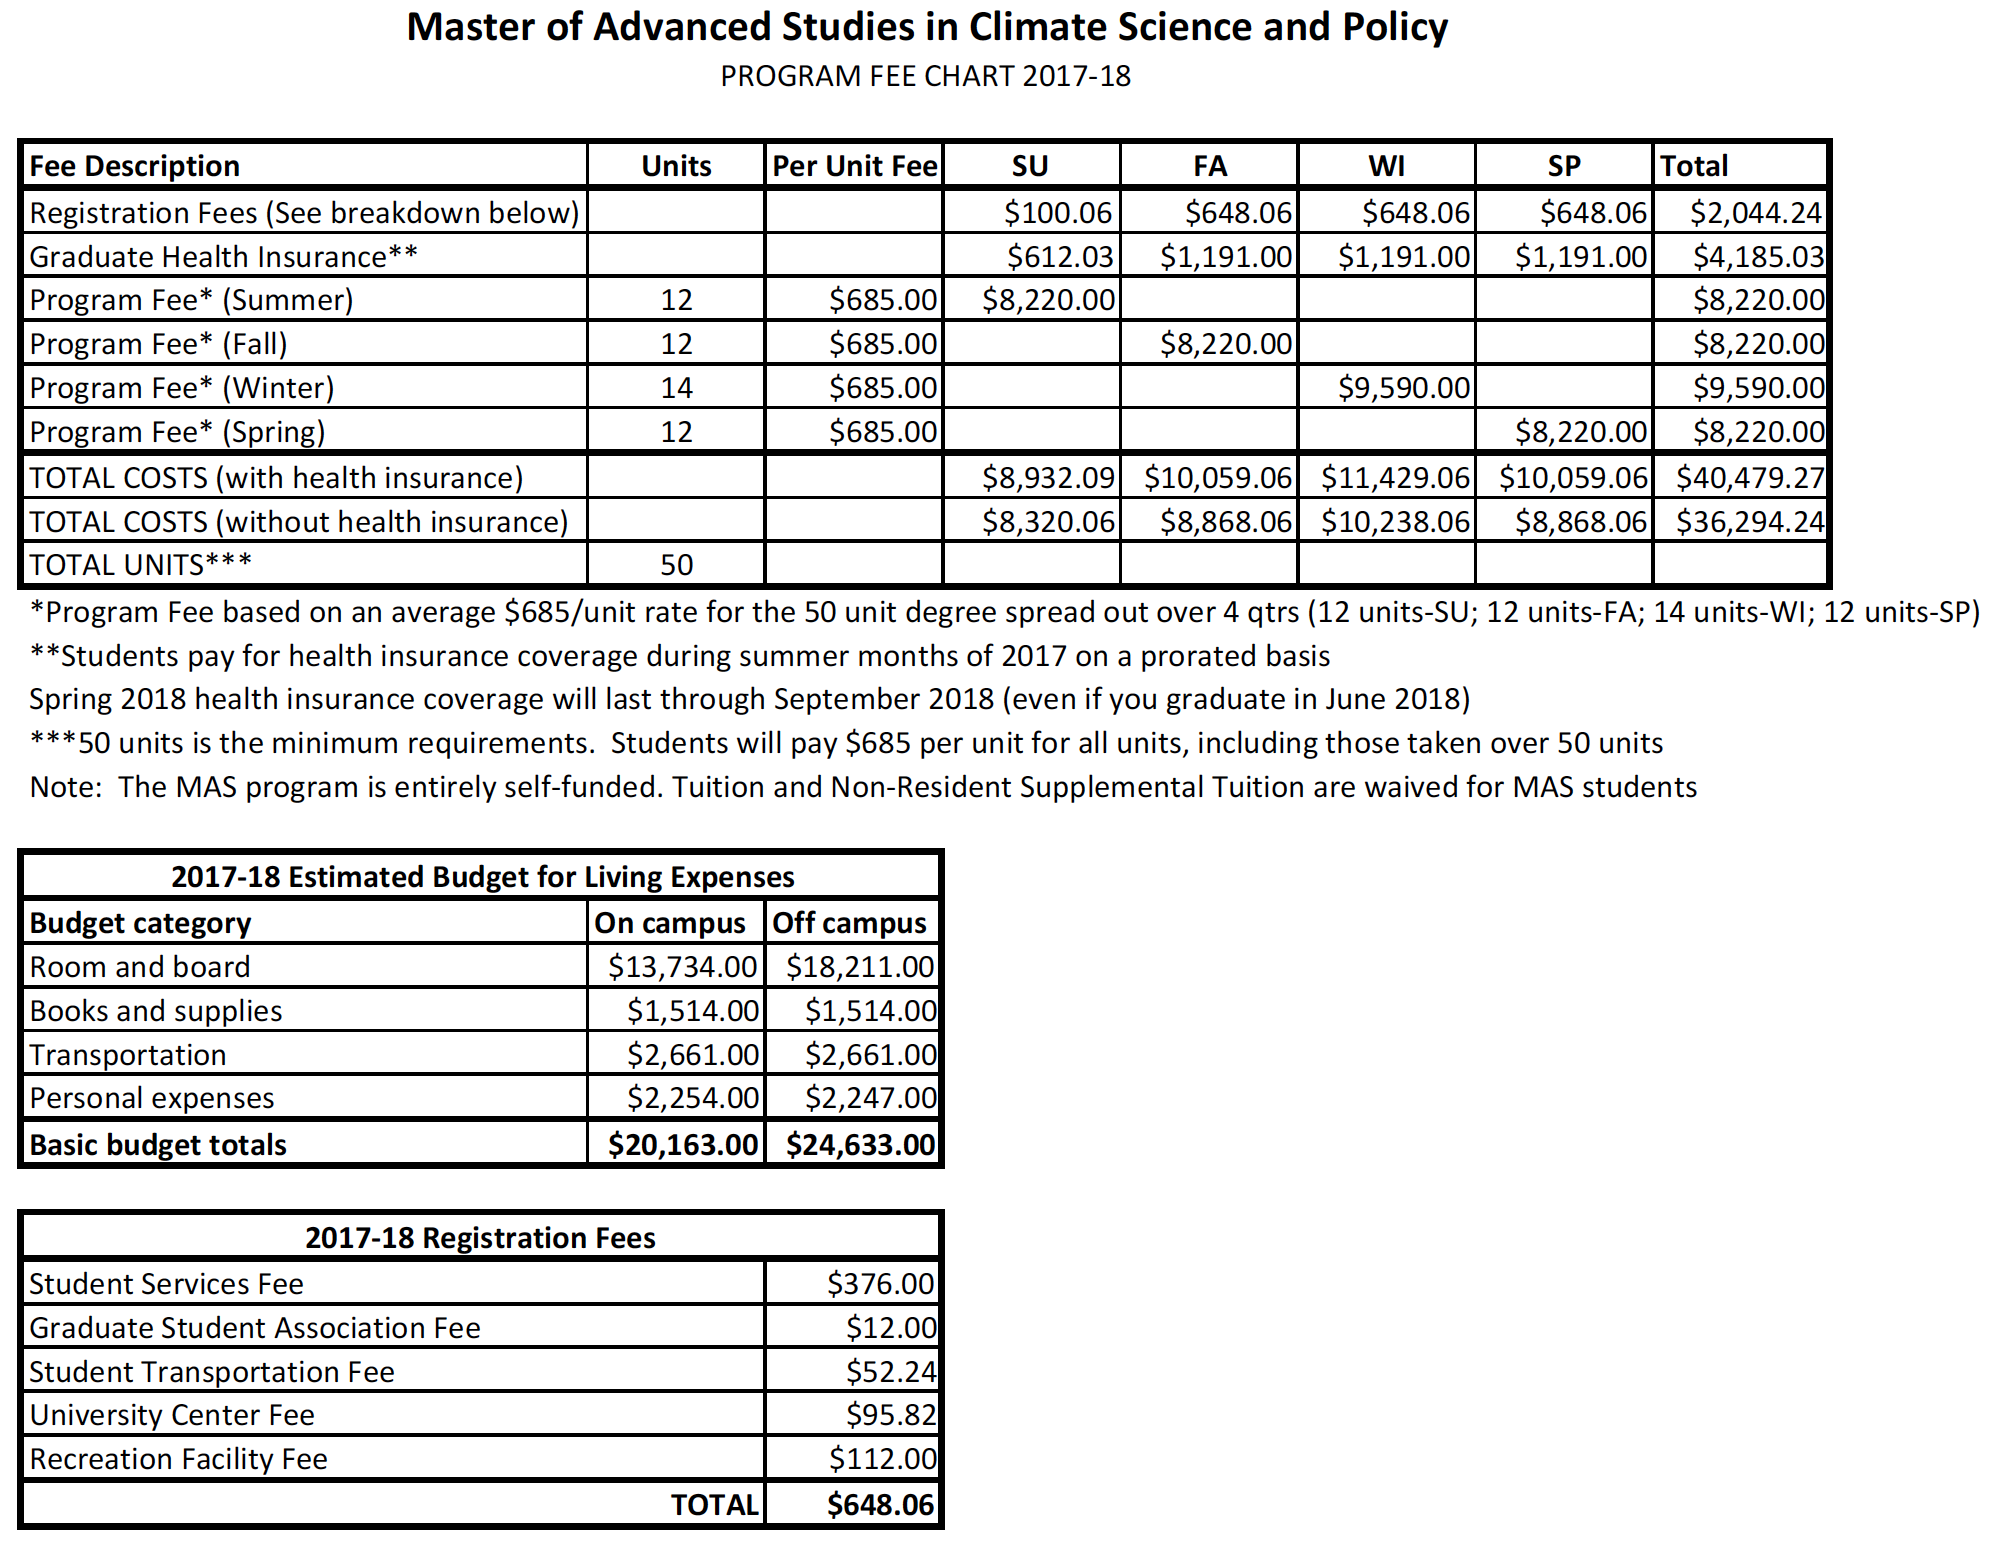 2017-18 MAS-CSP Program Fees